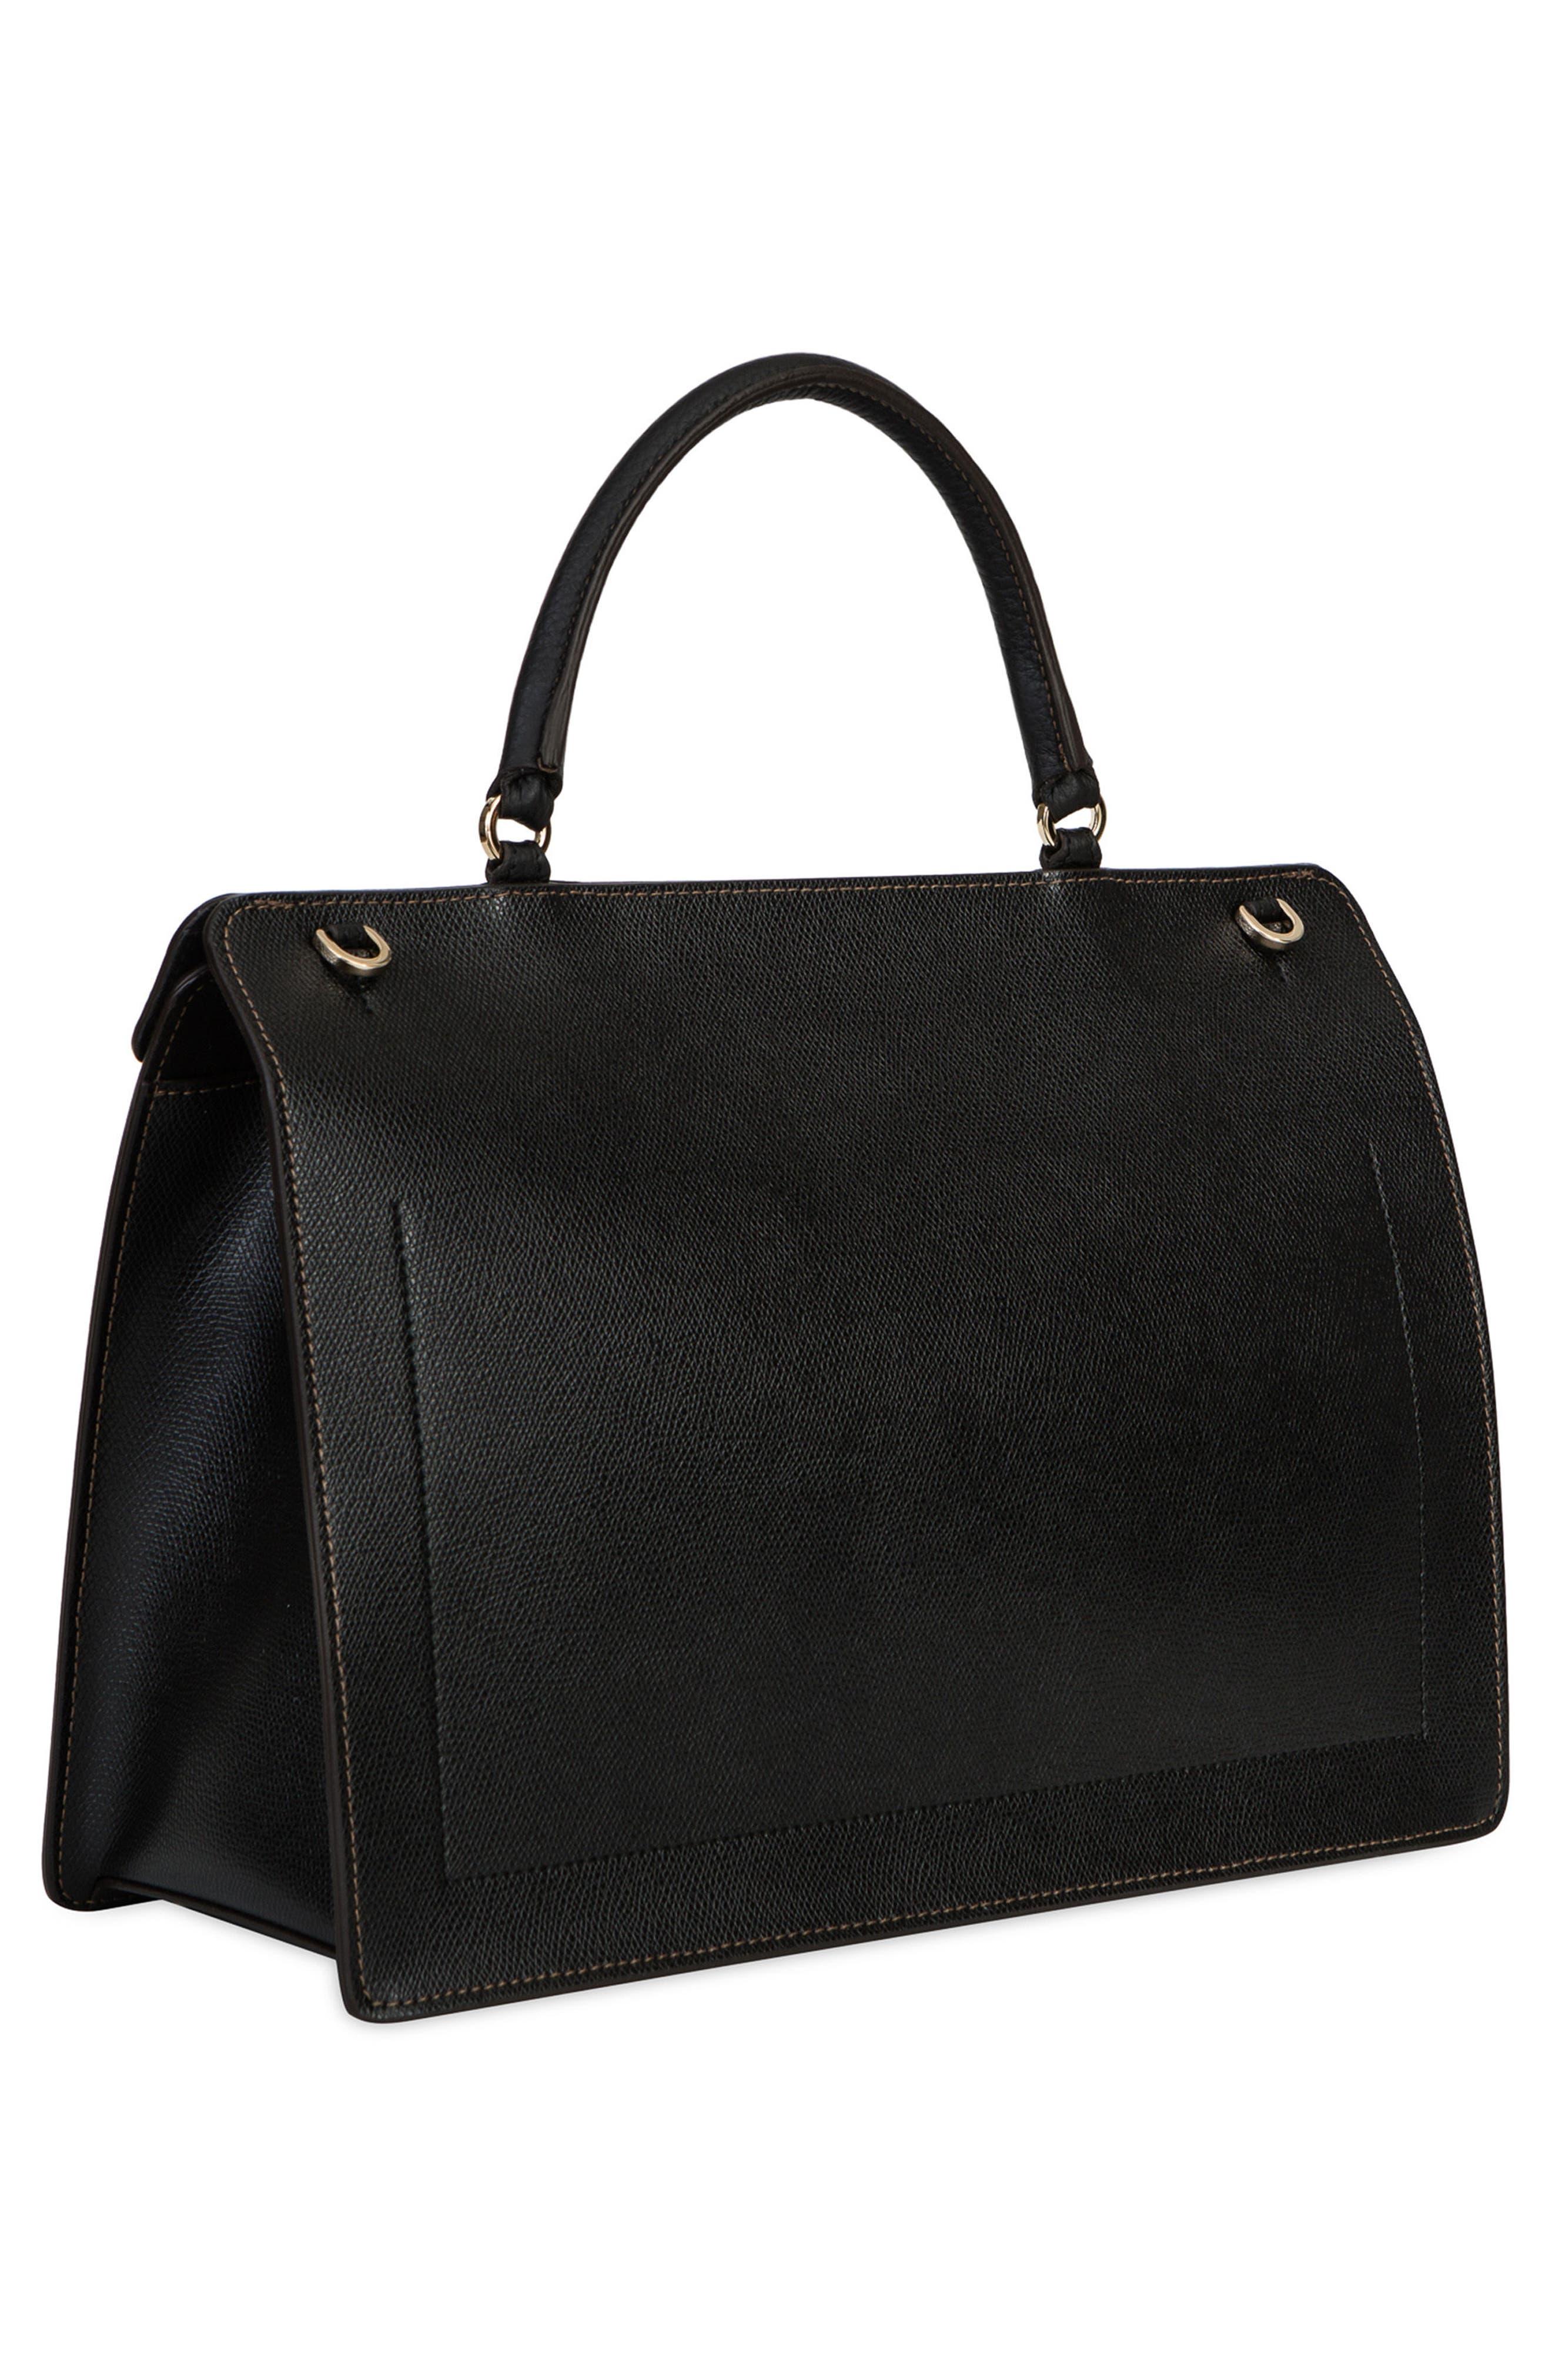 Alternate Image 2  - Furla Small Like Leather Top Handle Convertible Satchel